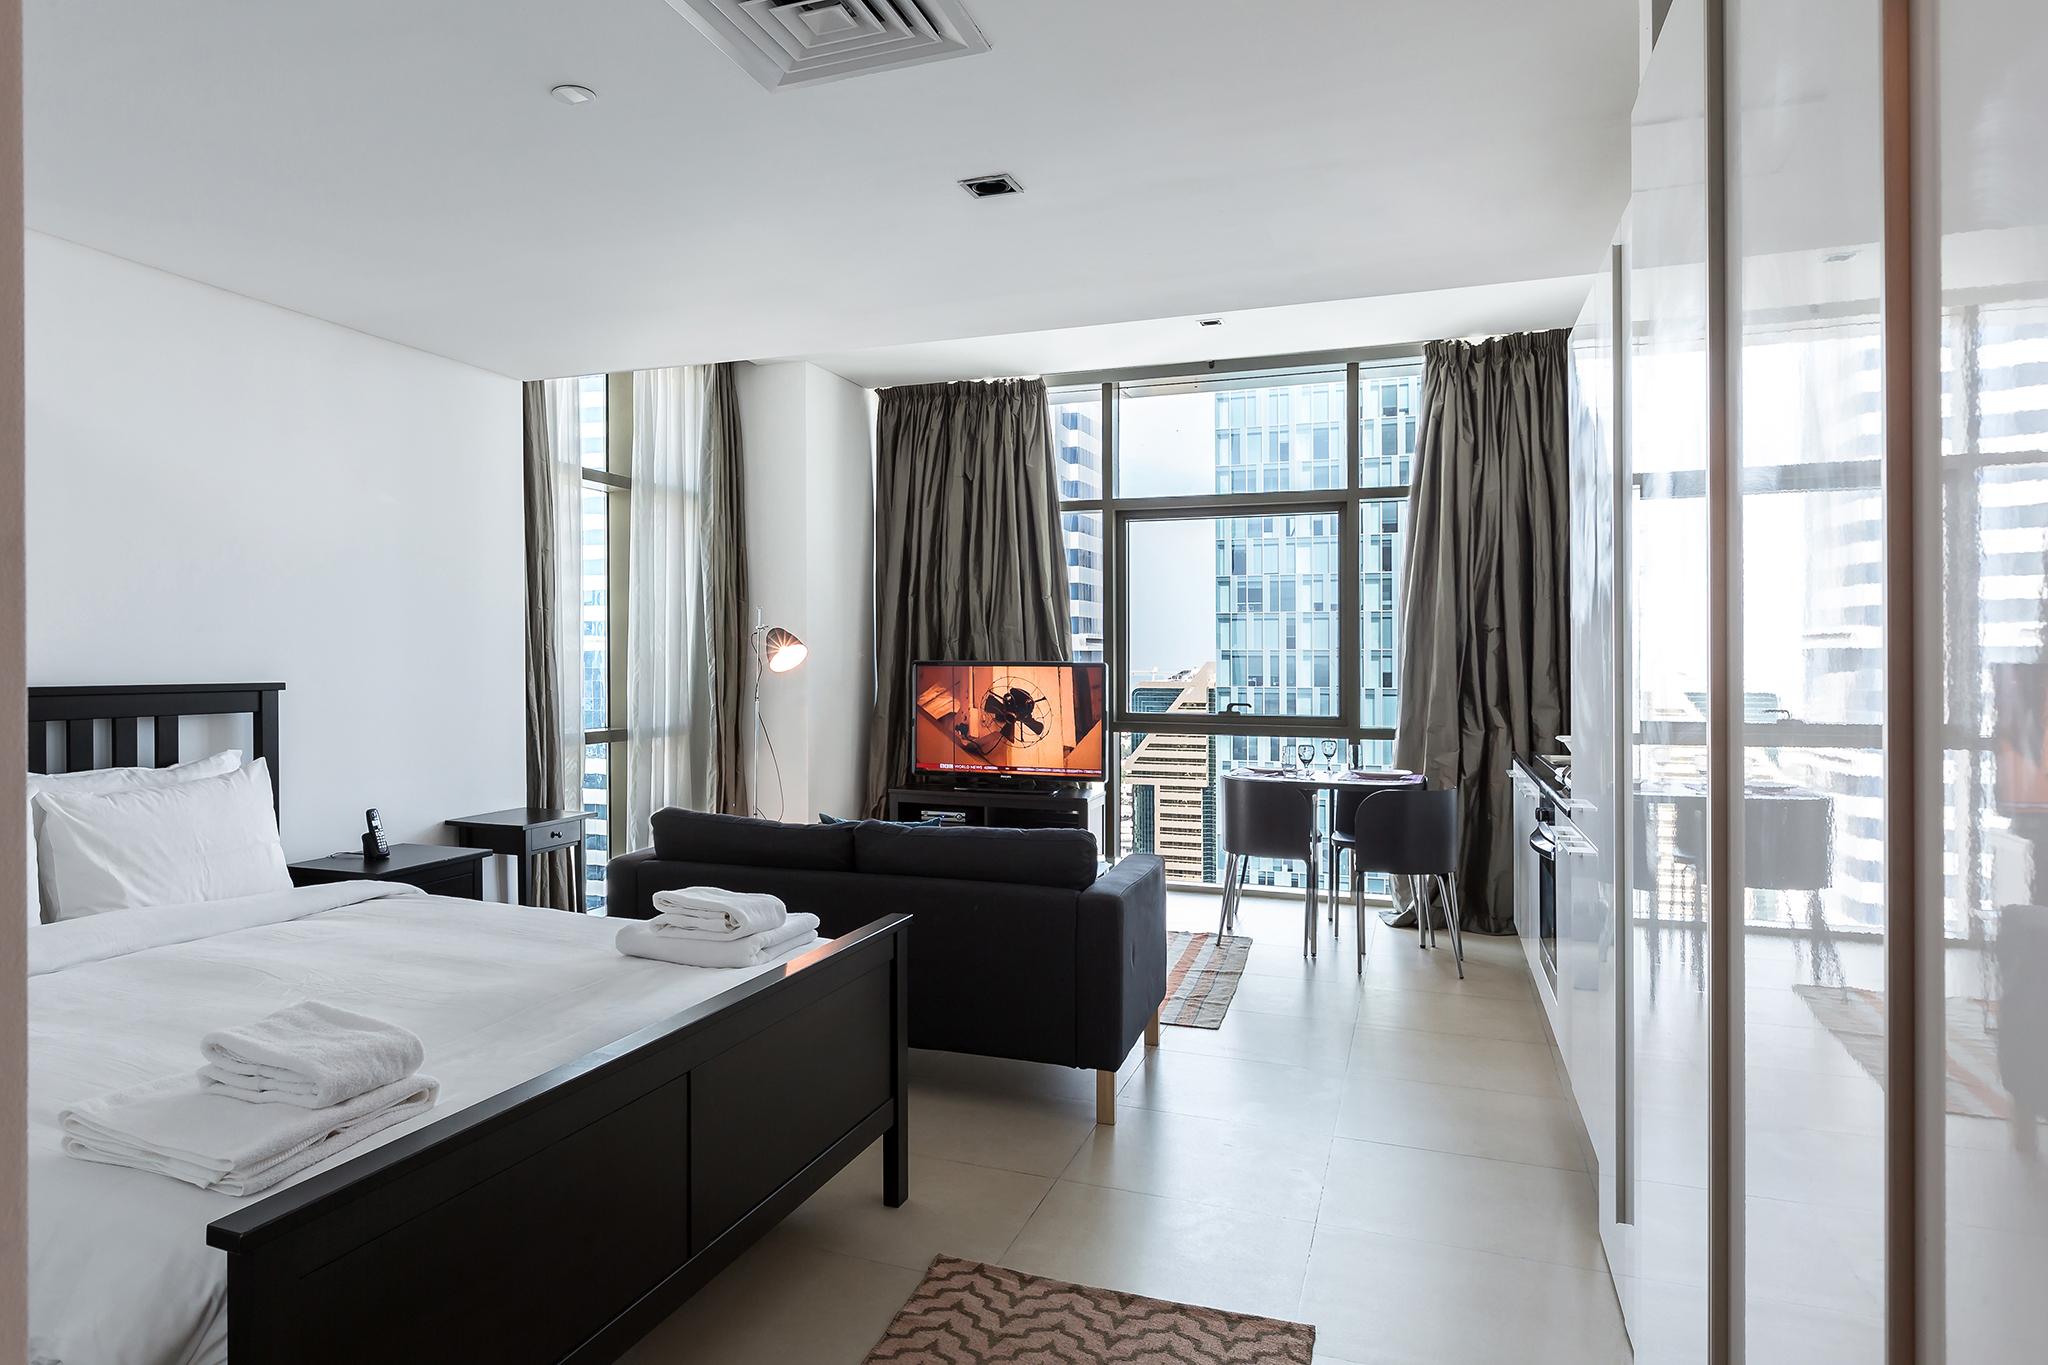 The studio is a corner unit of one of Dubai's iconic sky scrapers